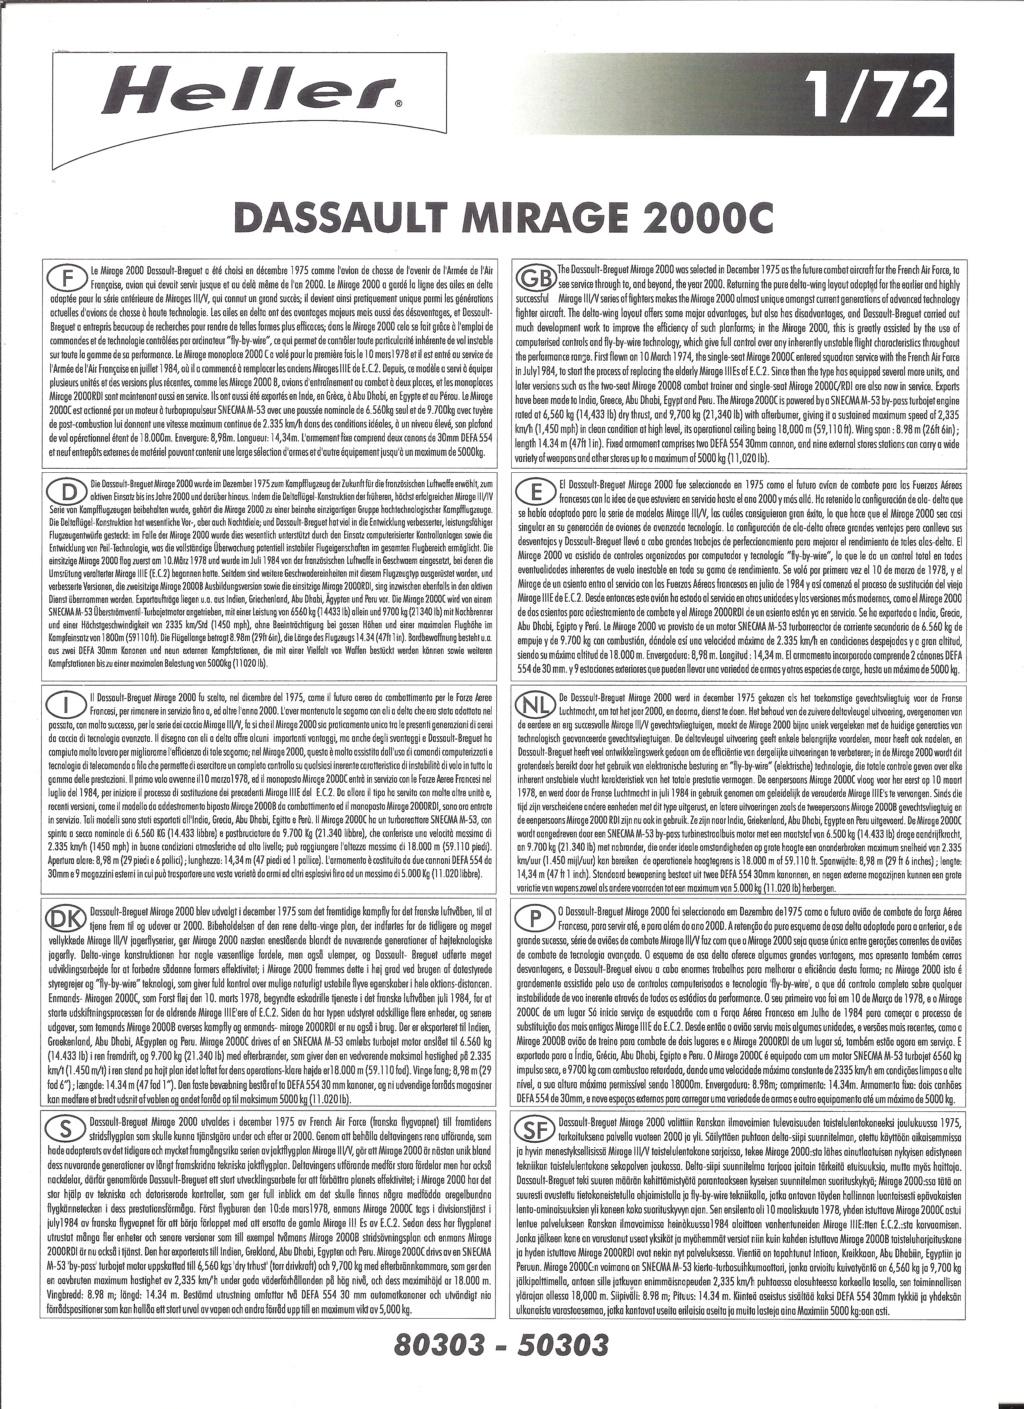 DASSAULT MIRAGE 2000 C 1/72ème Réf 80303 Notice Helle567